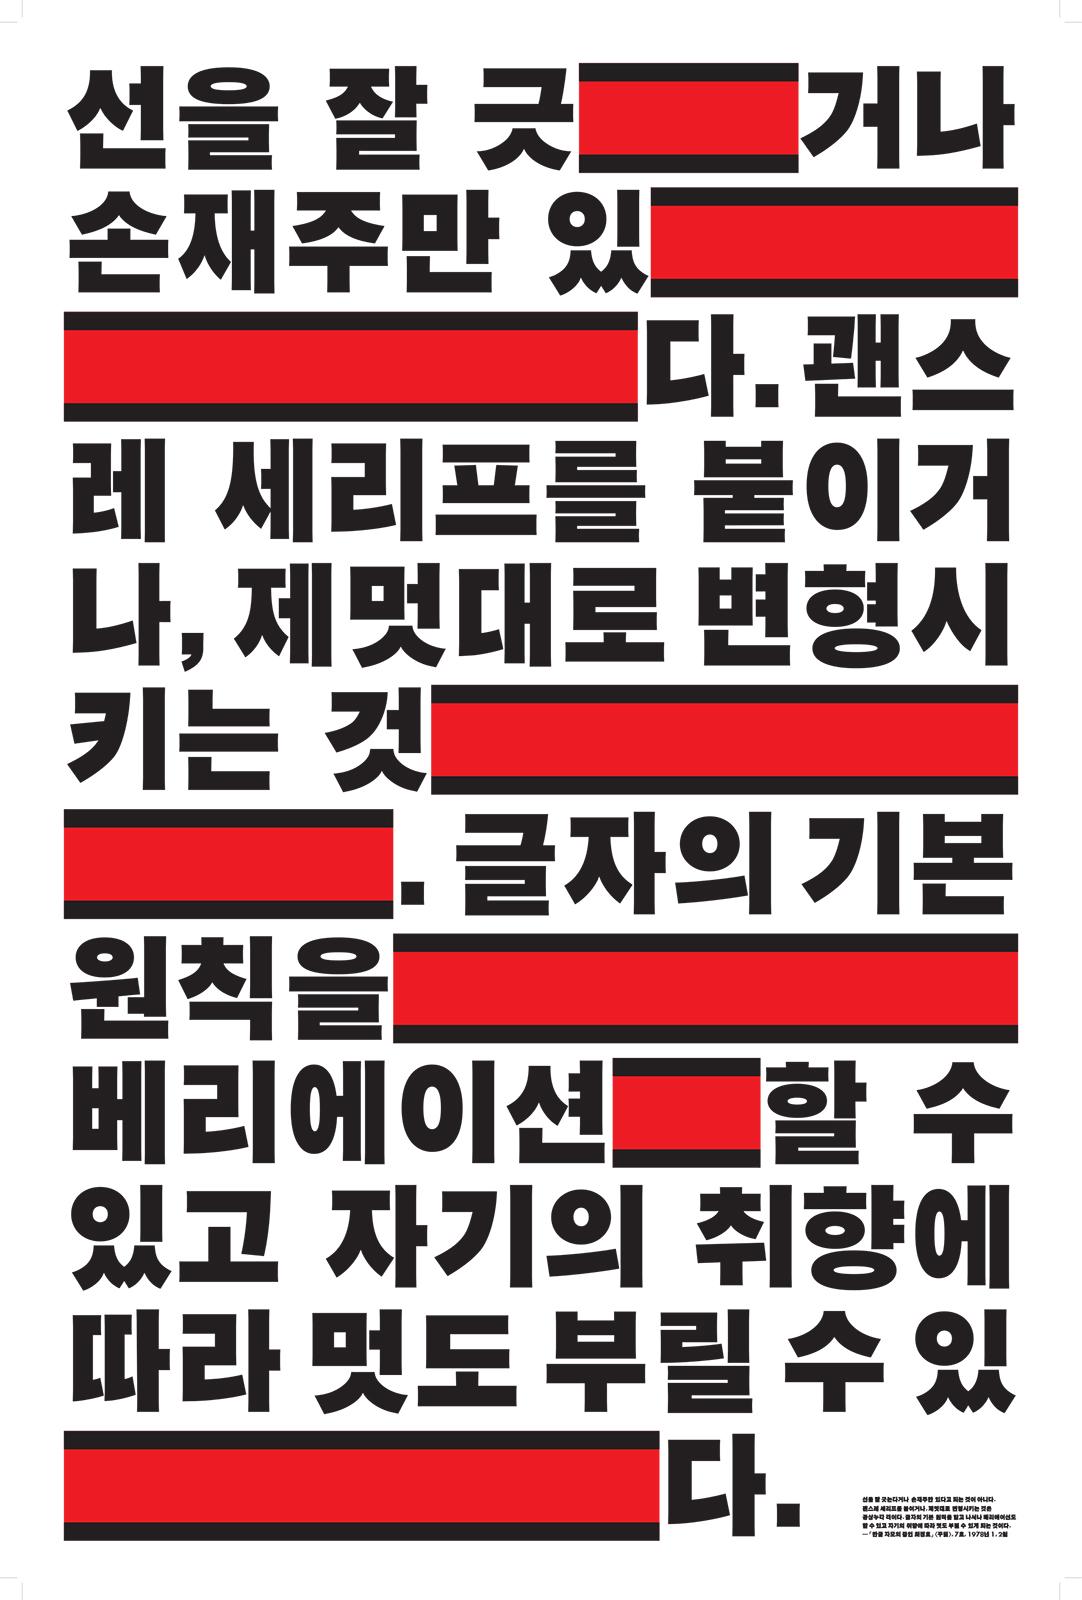 Choi Jeong-ho 최정호 600x900mm. Offset Print